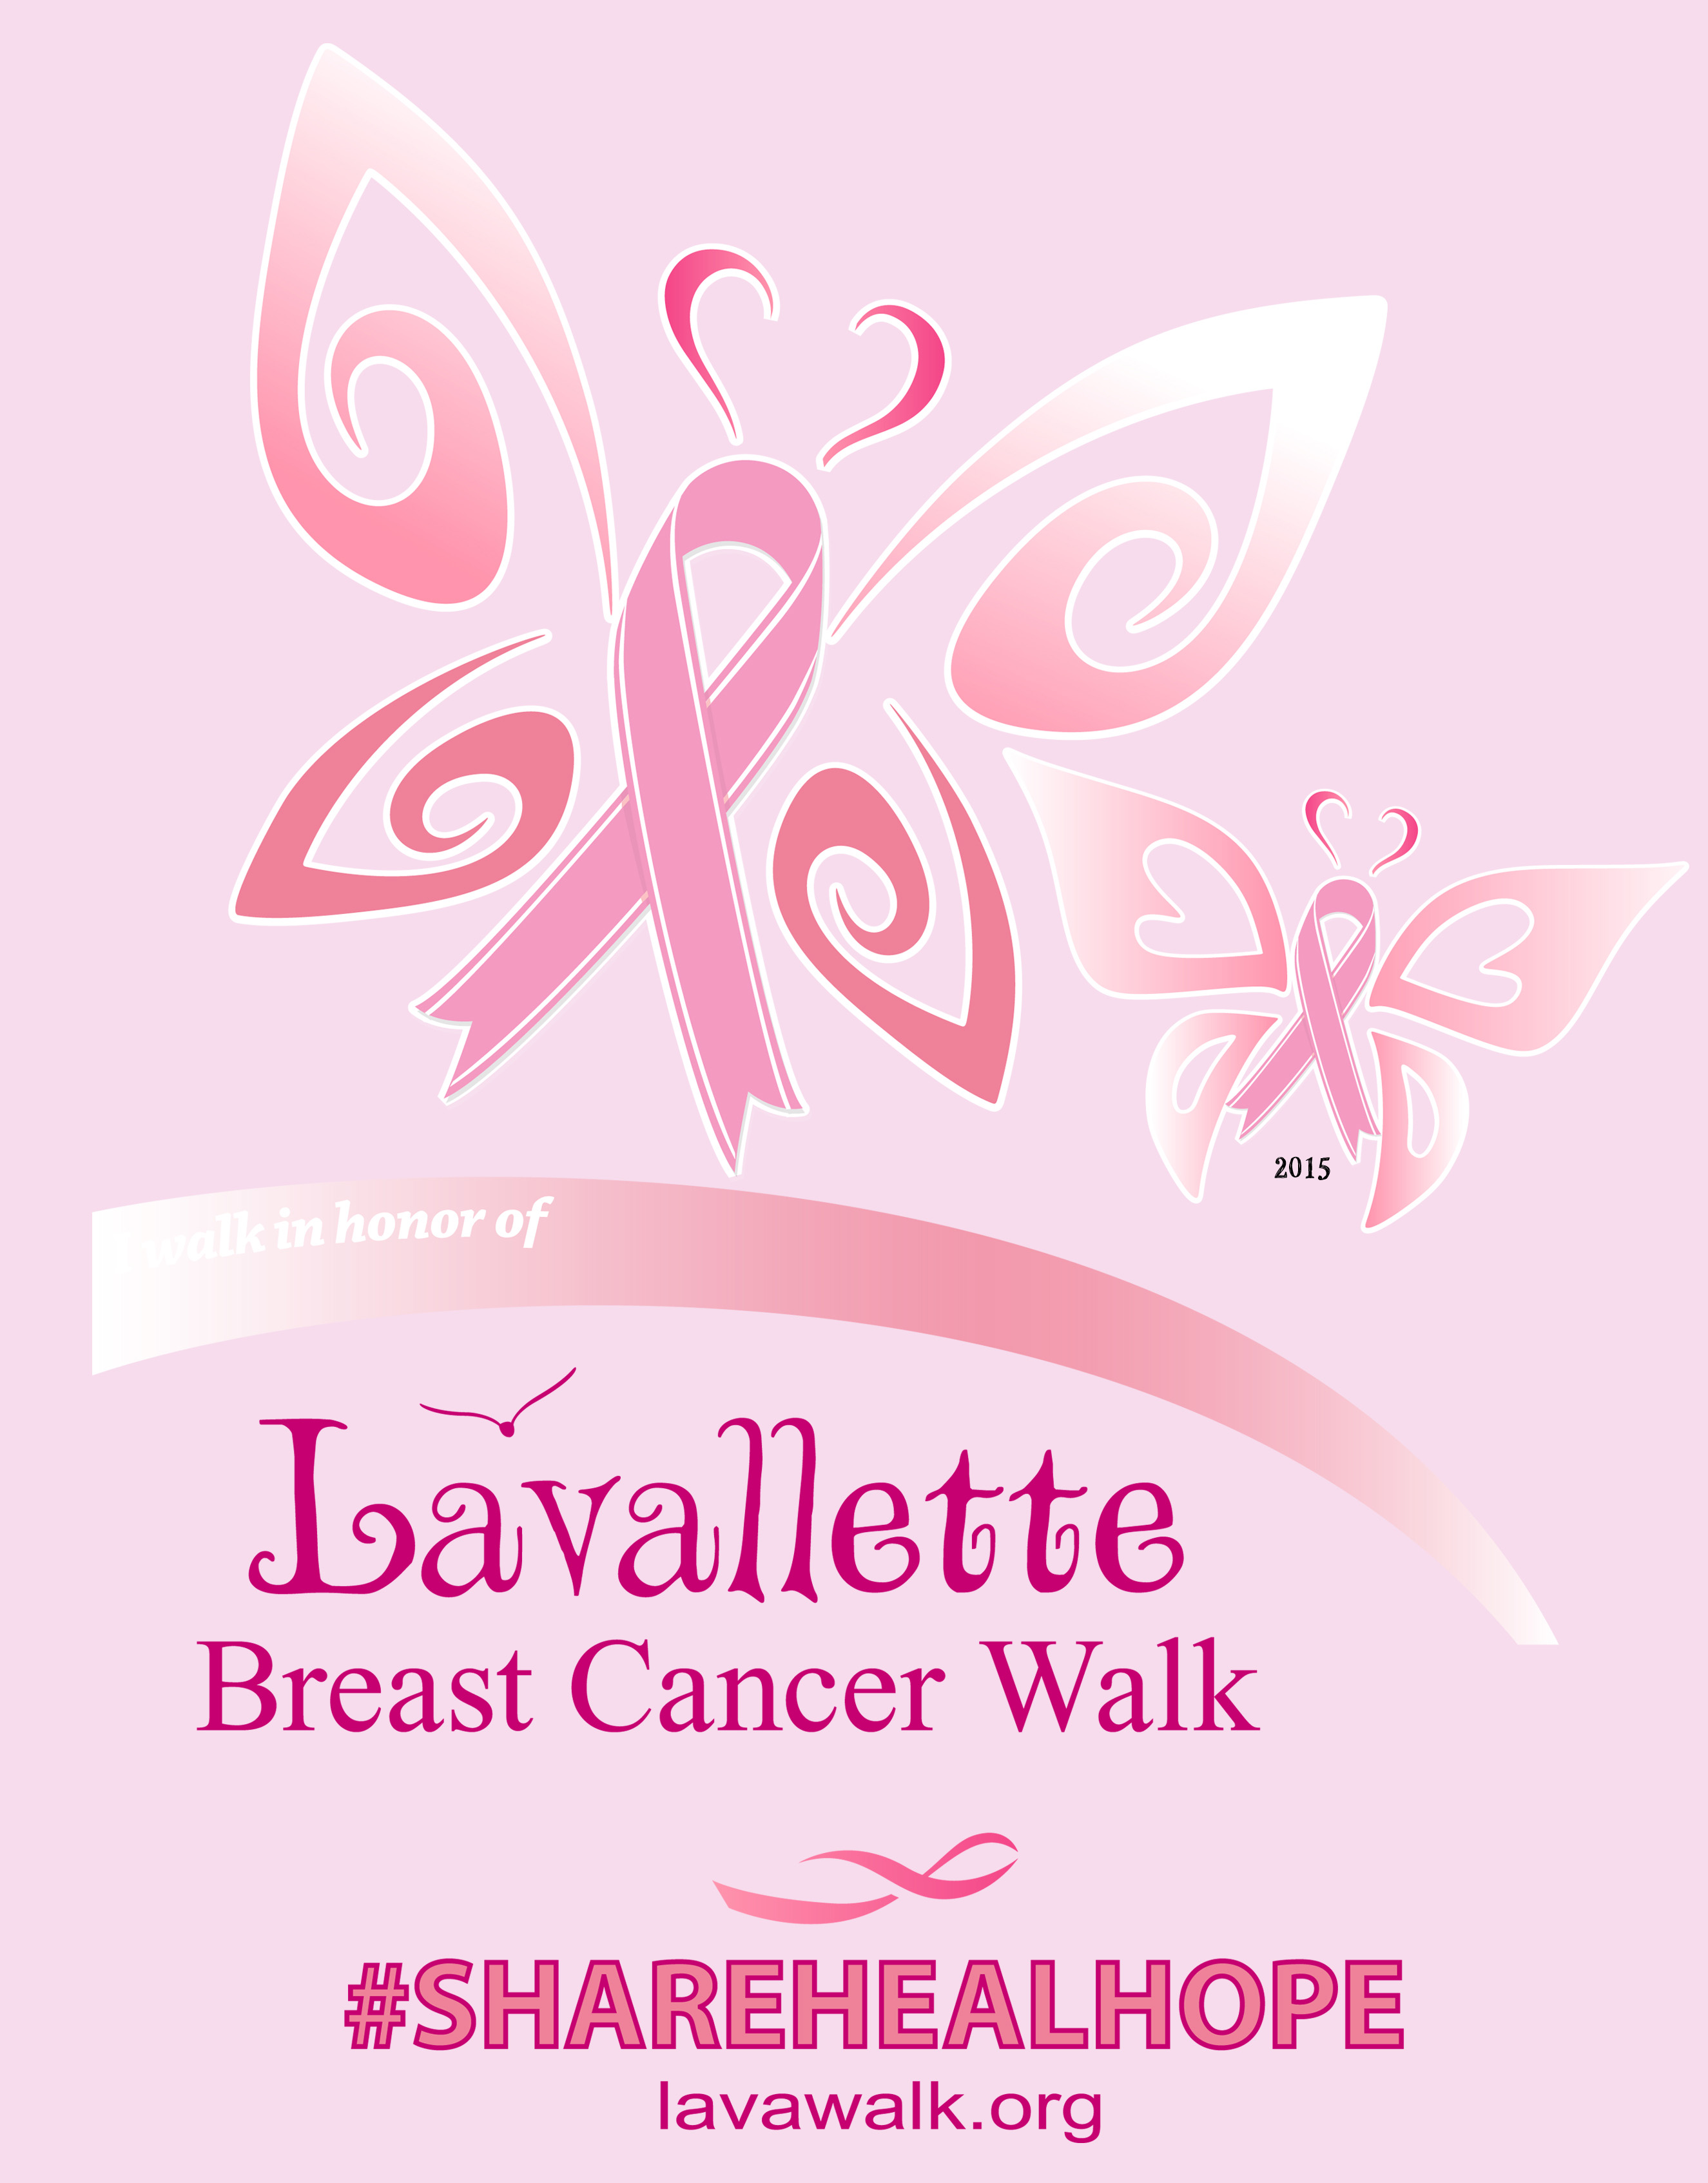 Lavallette Breast Cancer Walk